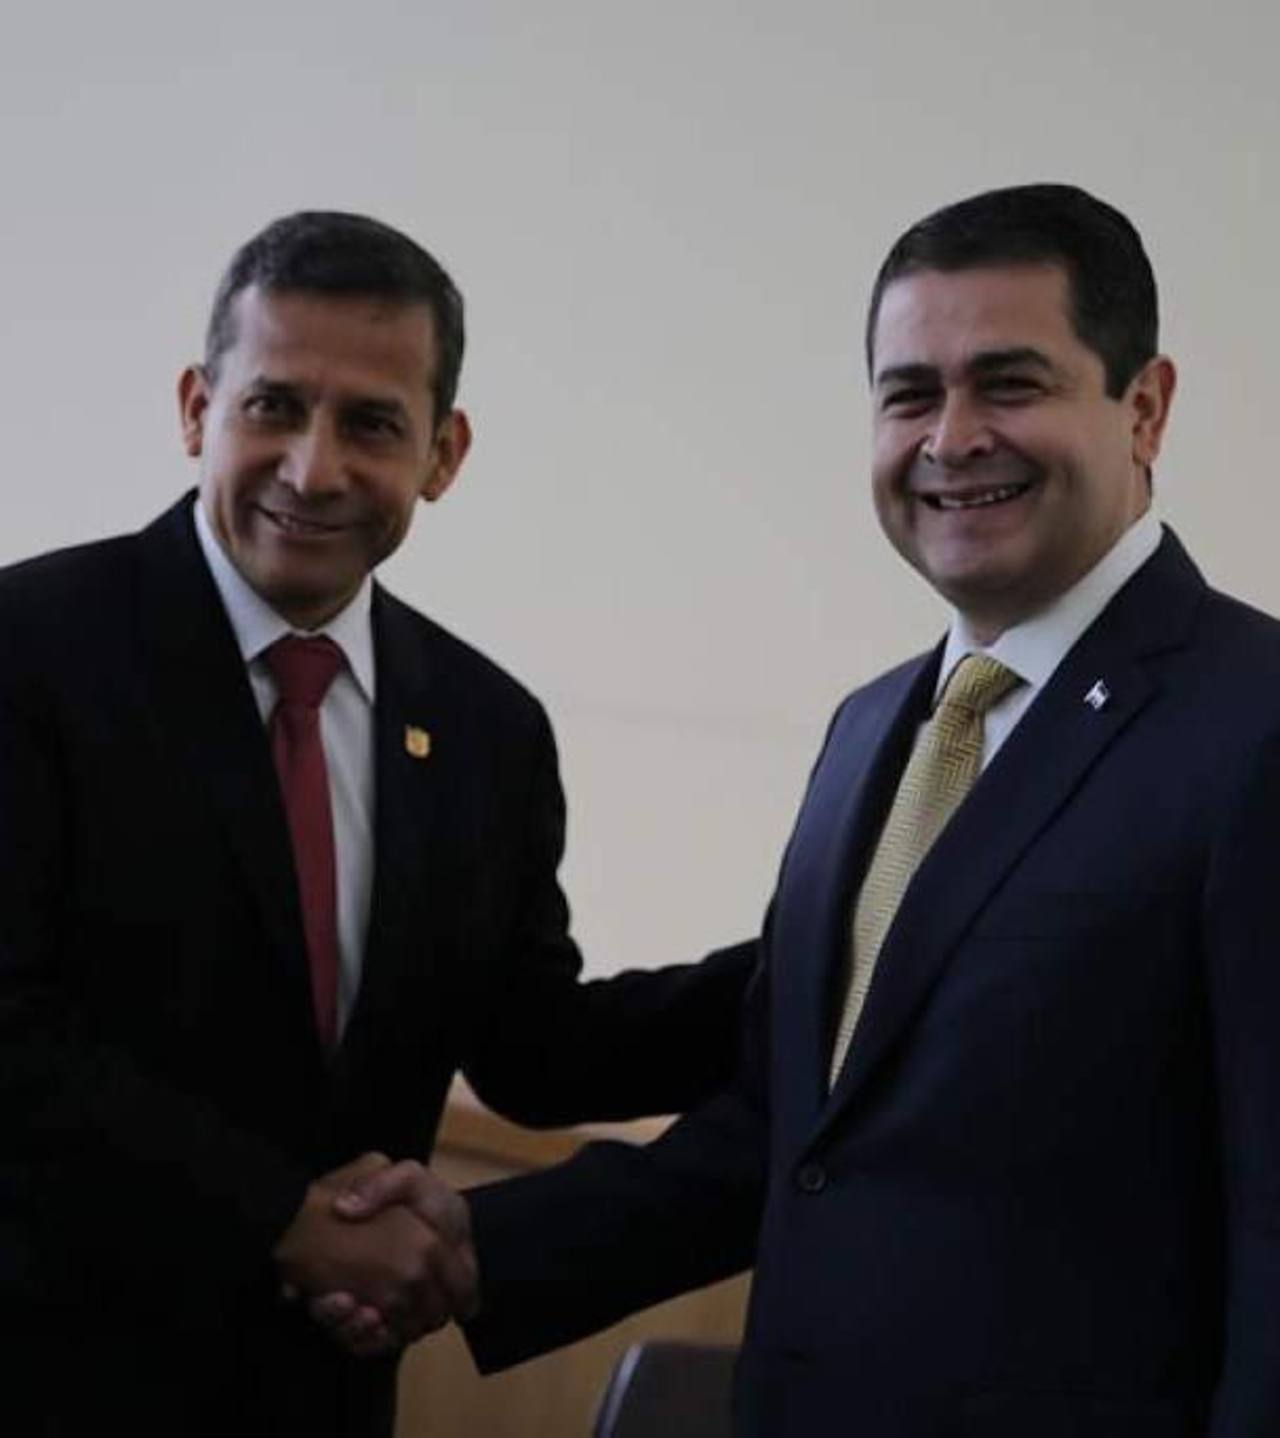 El presidente de Honduras llegó anoche a Lima, luego de visitar Chile. Foto EDH